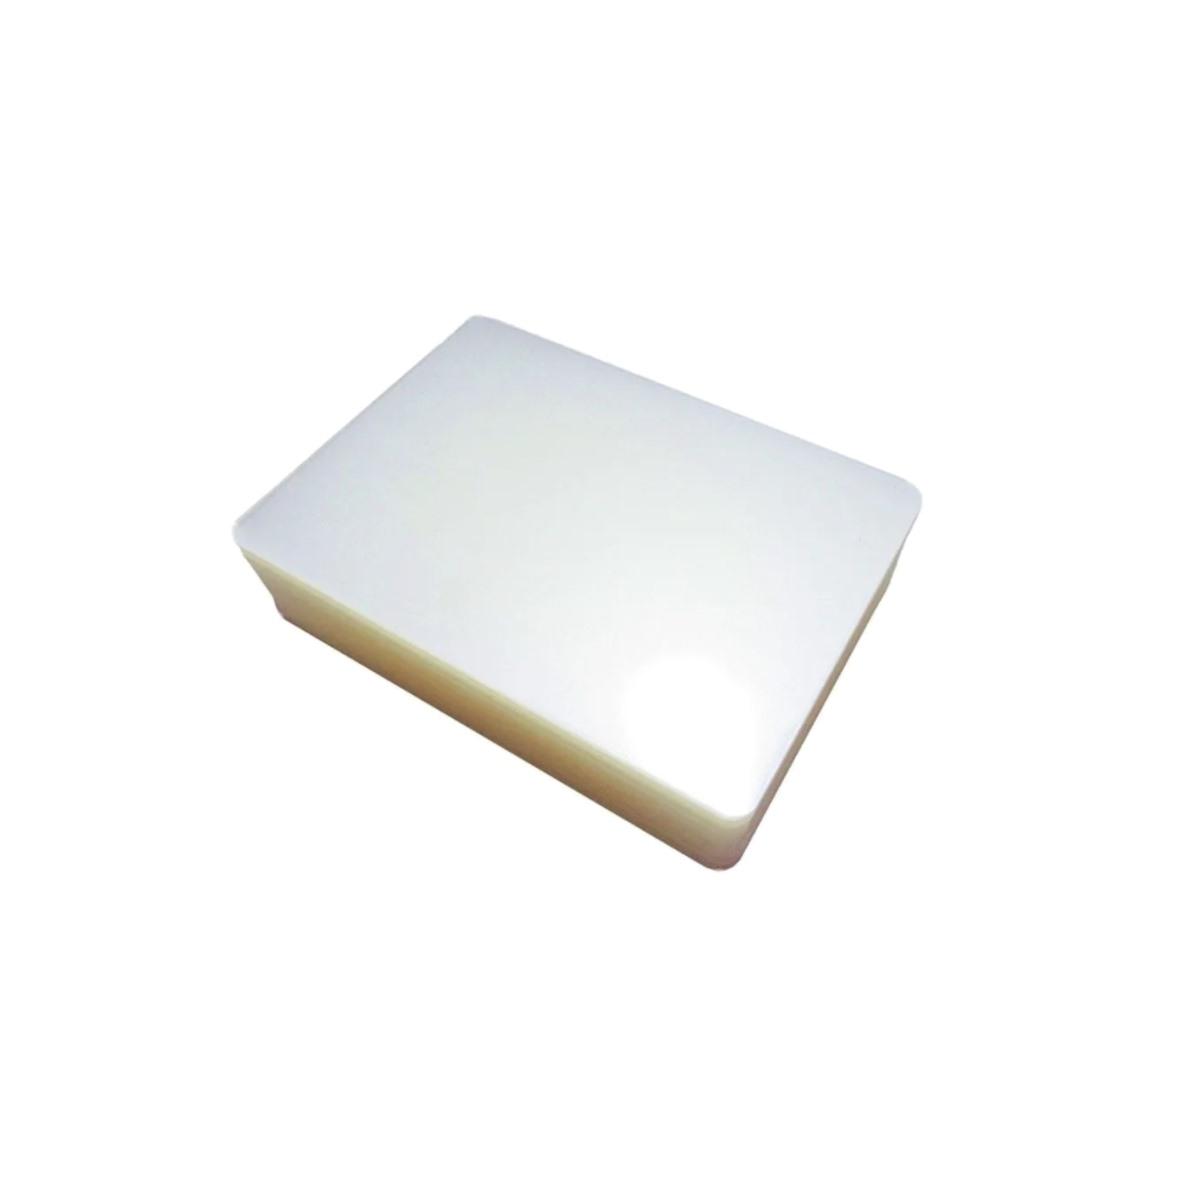 Polaseal plástico para plastificação CPF 66X99 0,05mm 100un